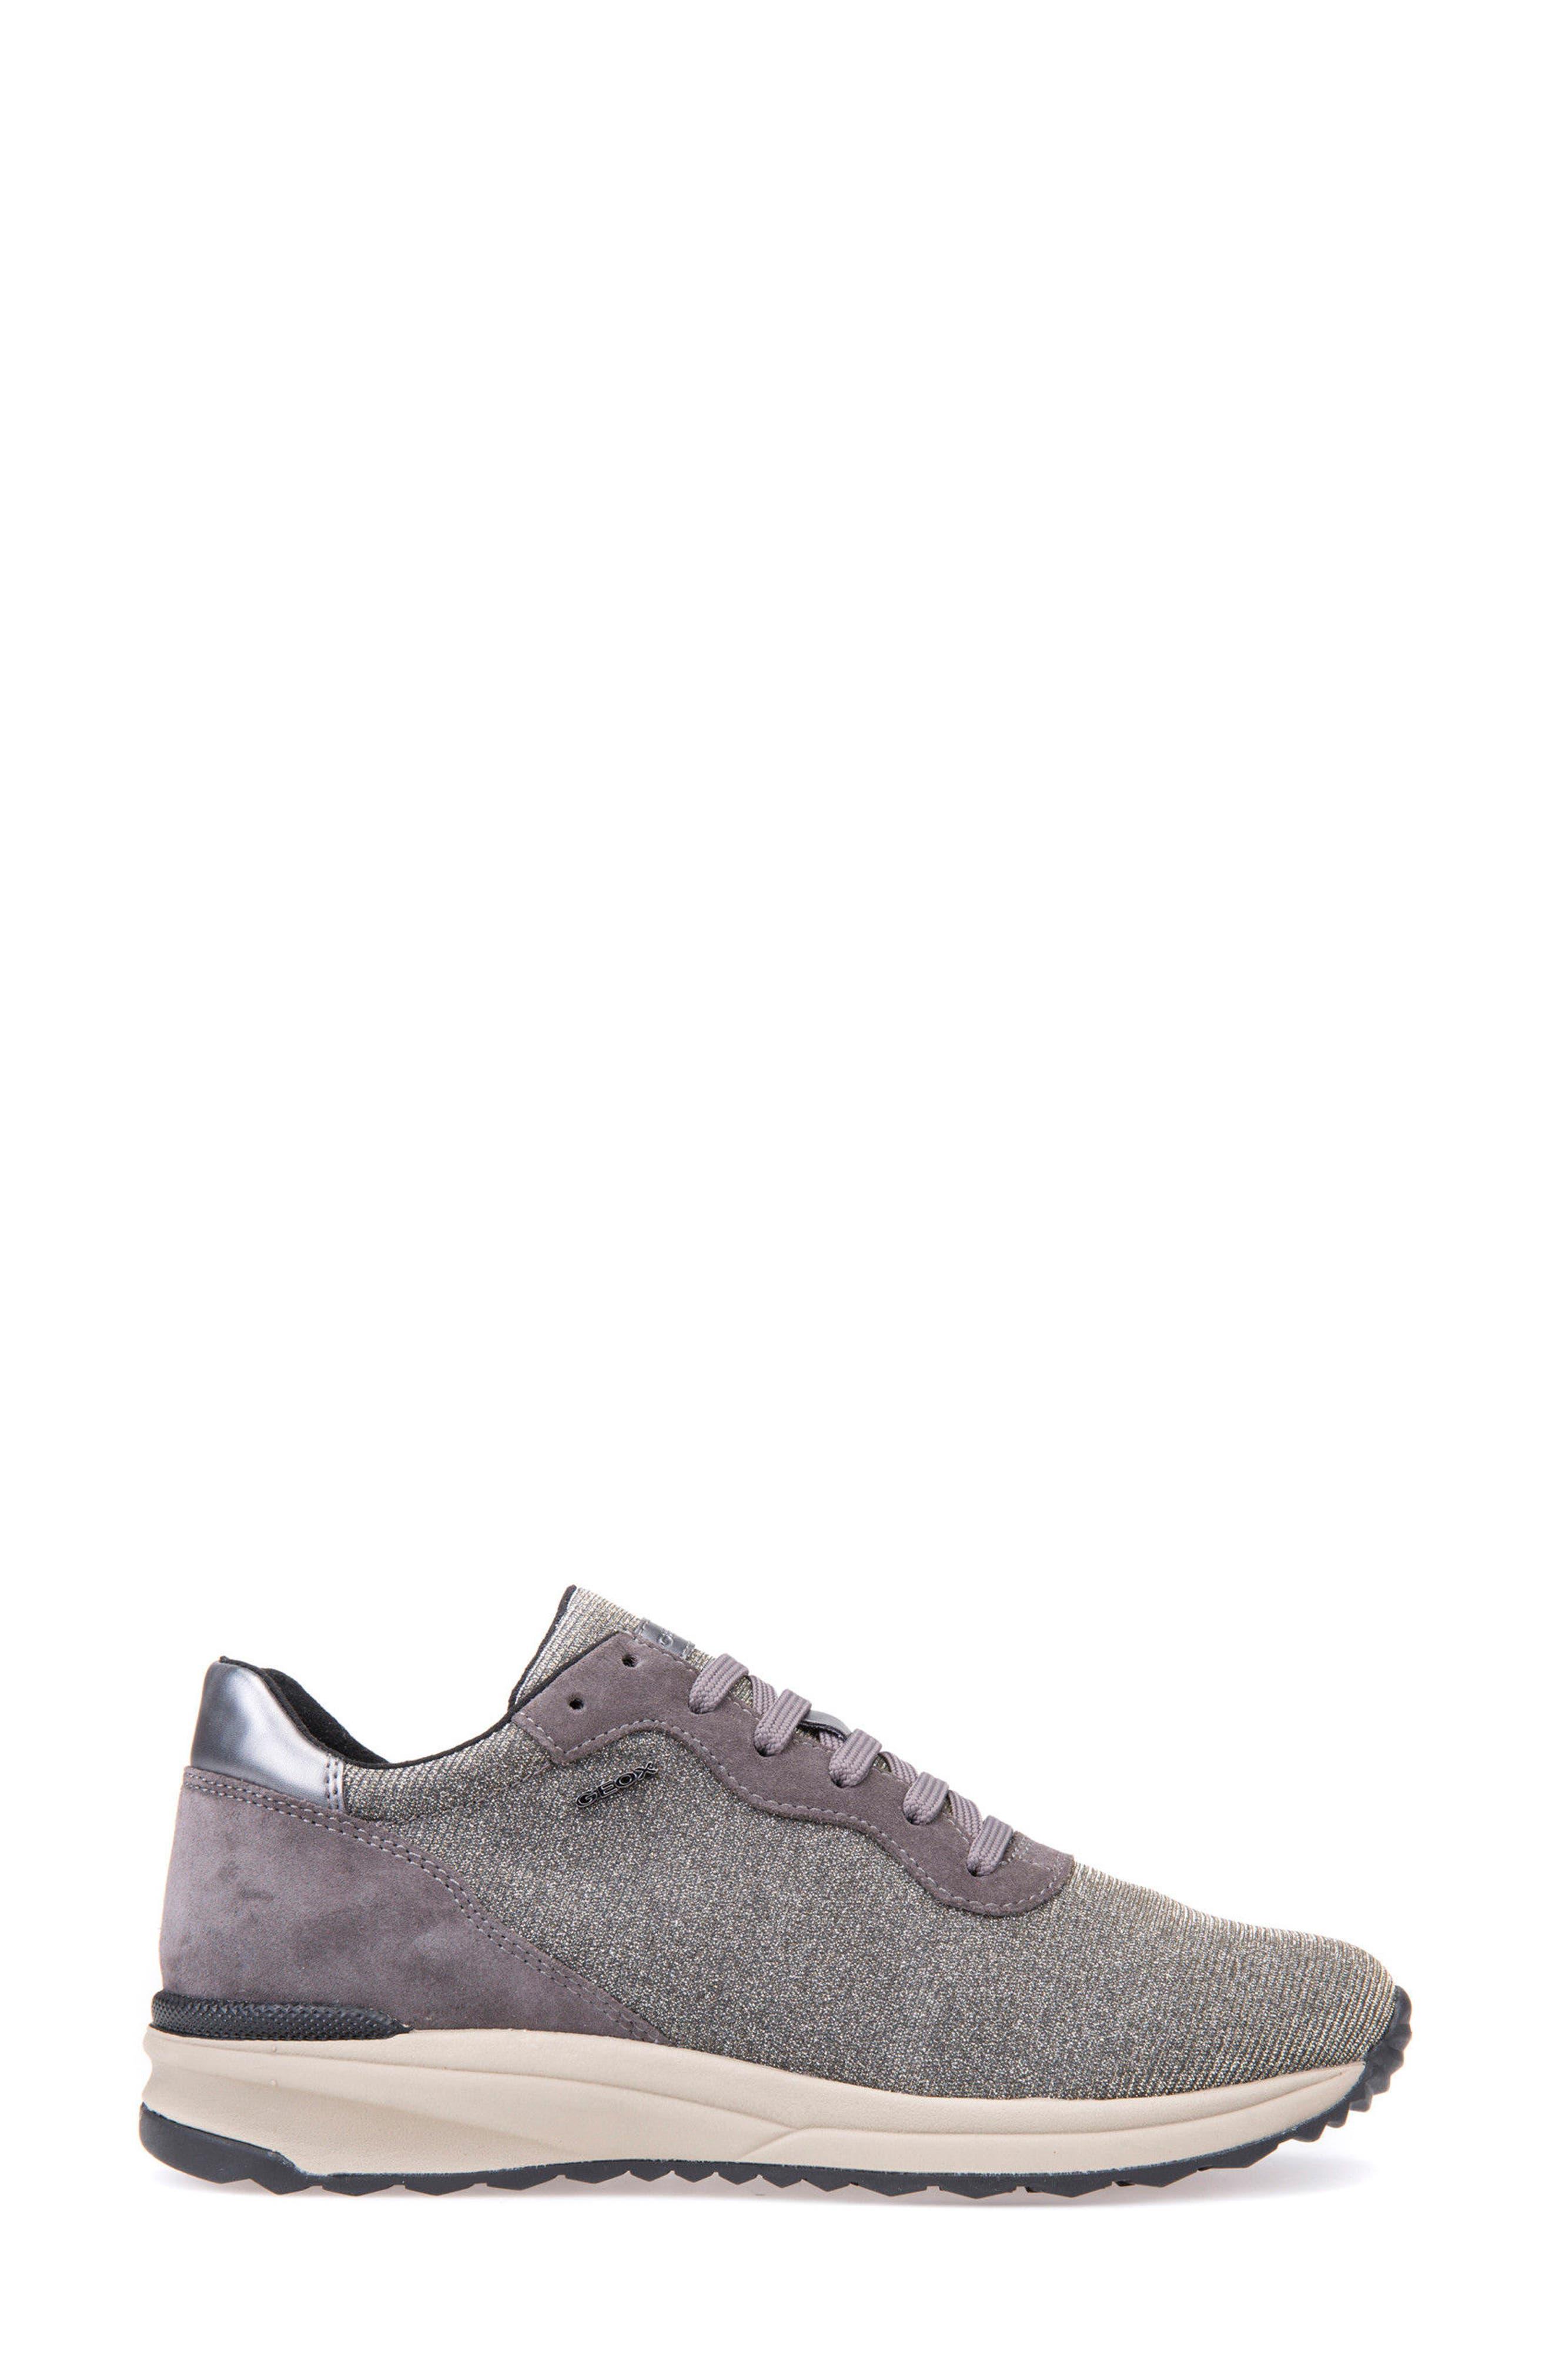 Alternate Image 3  - Geox Airell Sneaker (Women)